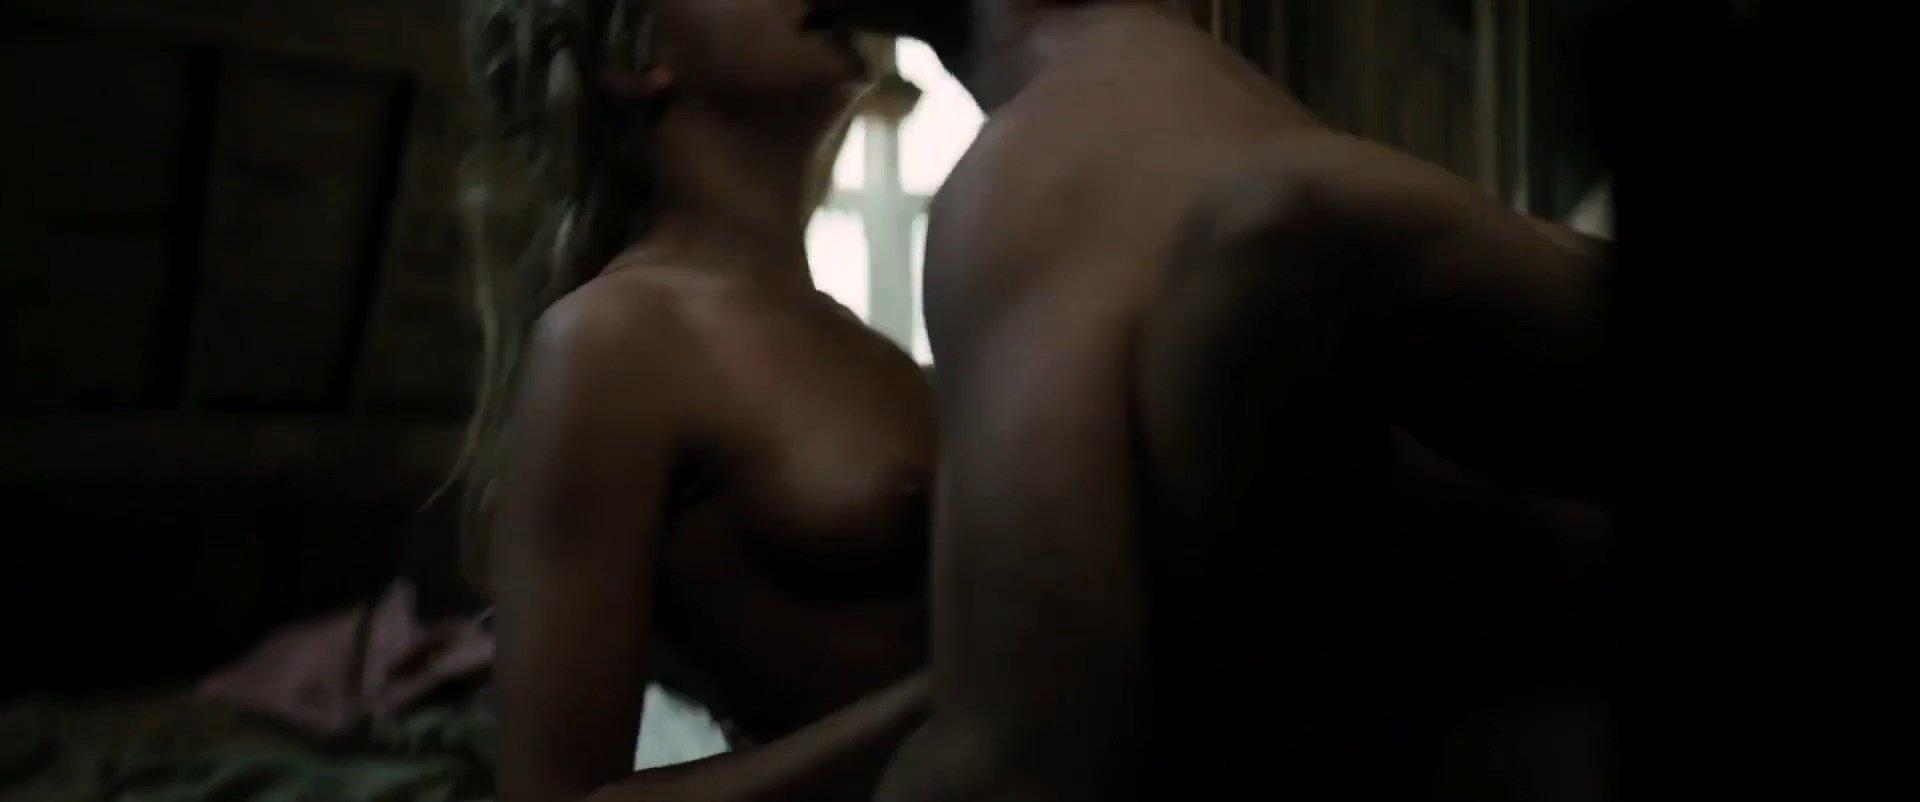 image Cara delevingne nude sex scene in tulip fever scandalplanet